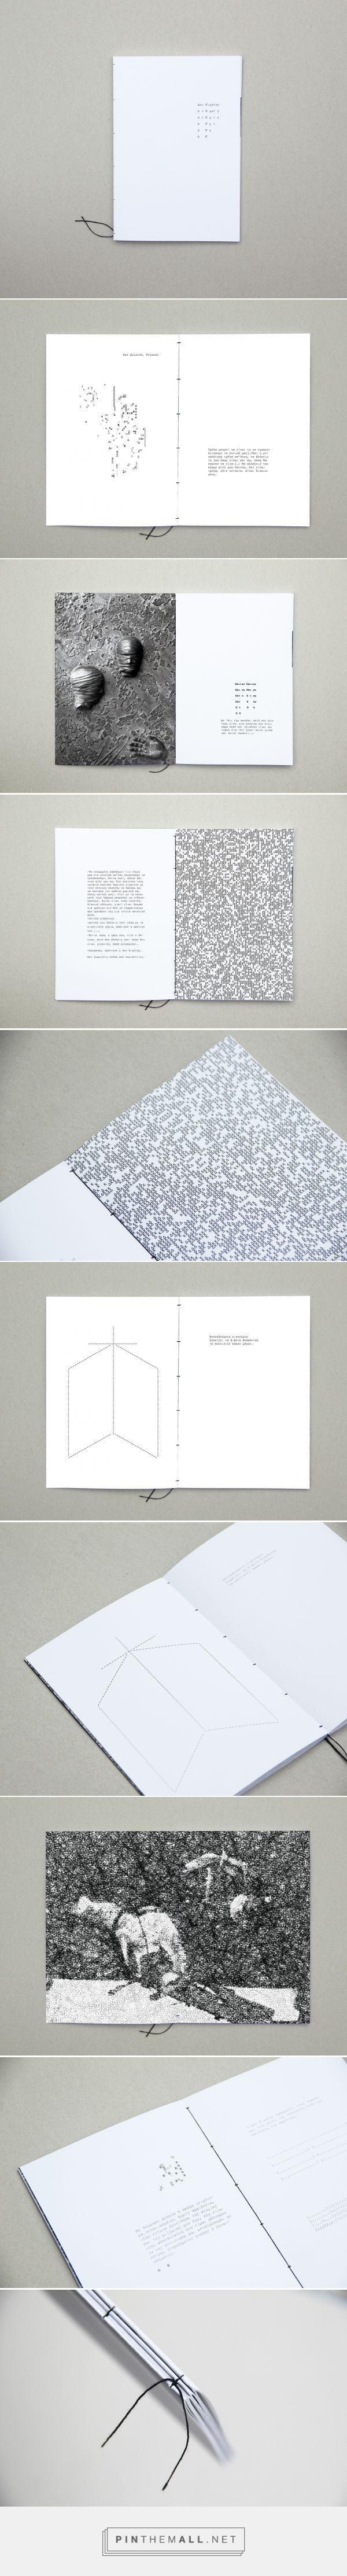 108 best architecture folio images on pinterest for Architectural portfolio ideas